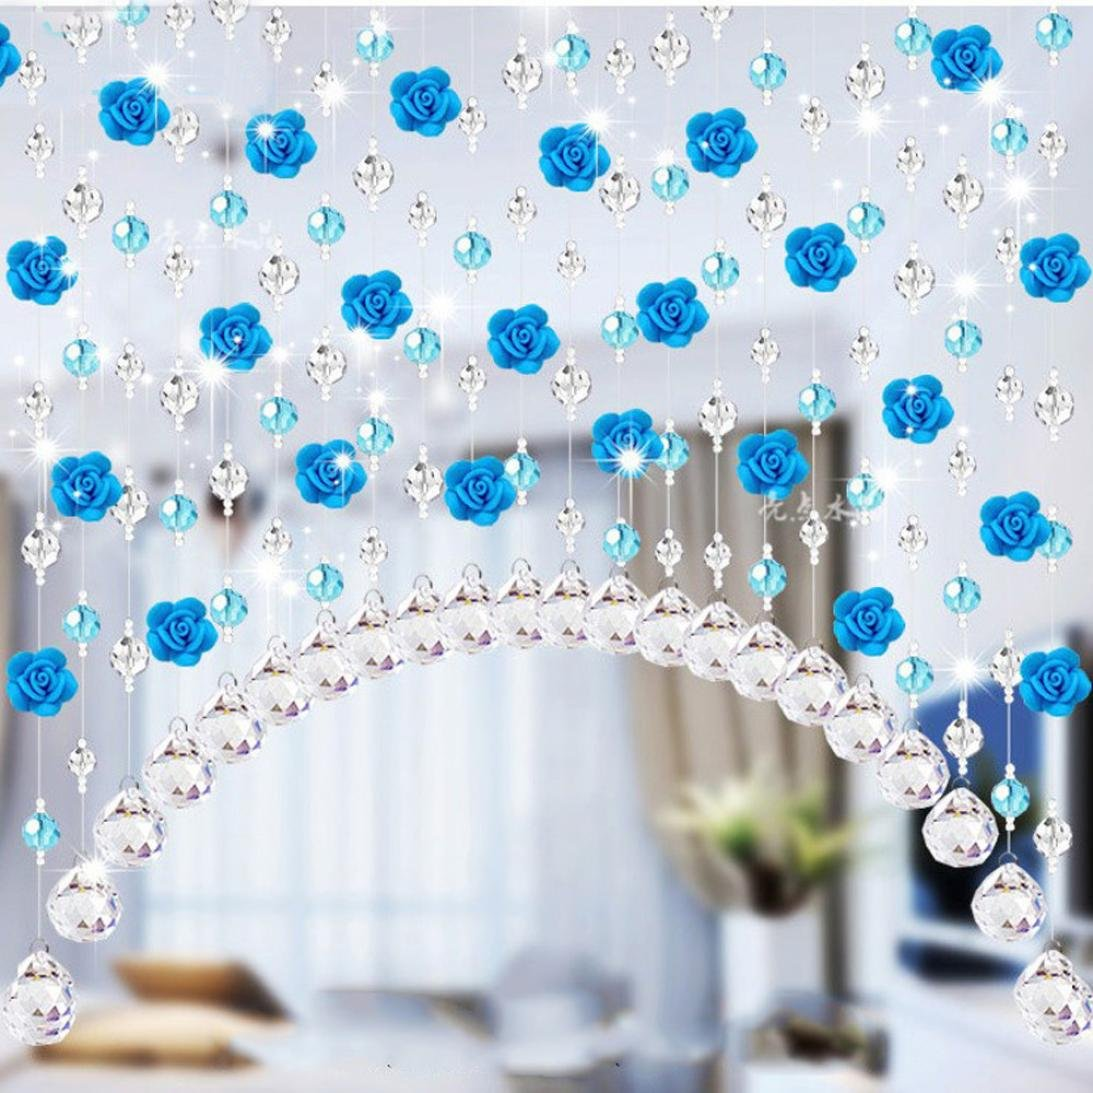 fasloyu Crystal Rose bead curtain chains Decor String Tassel for doors doorways Living Room Bedroom windows (A)